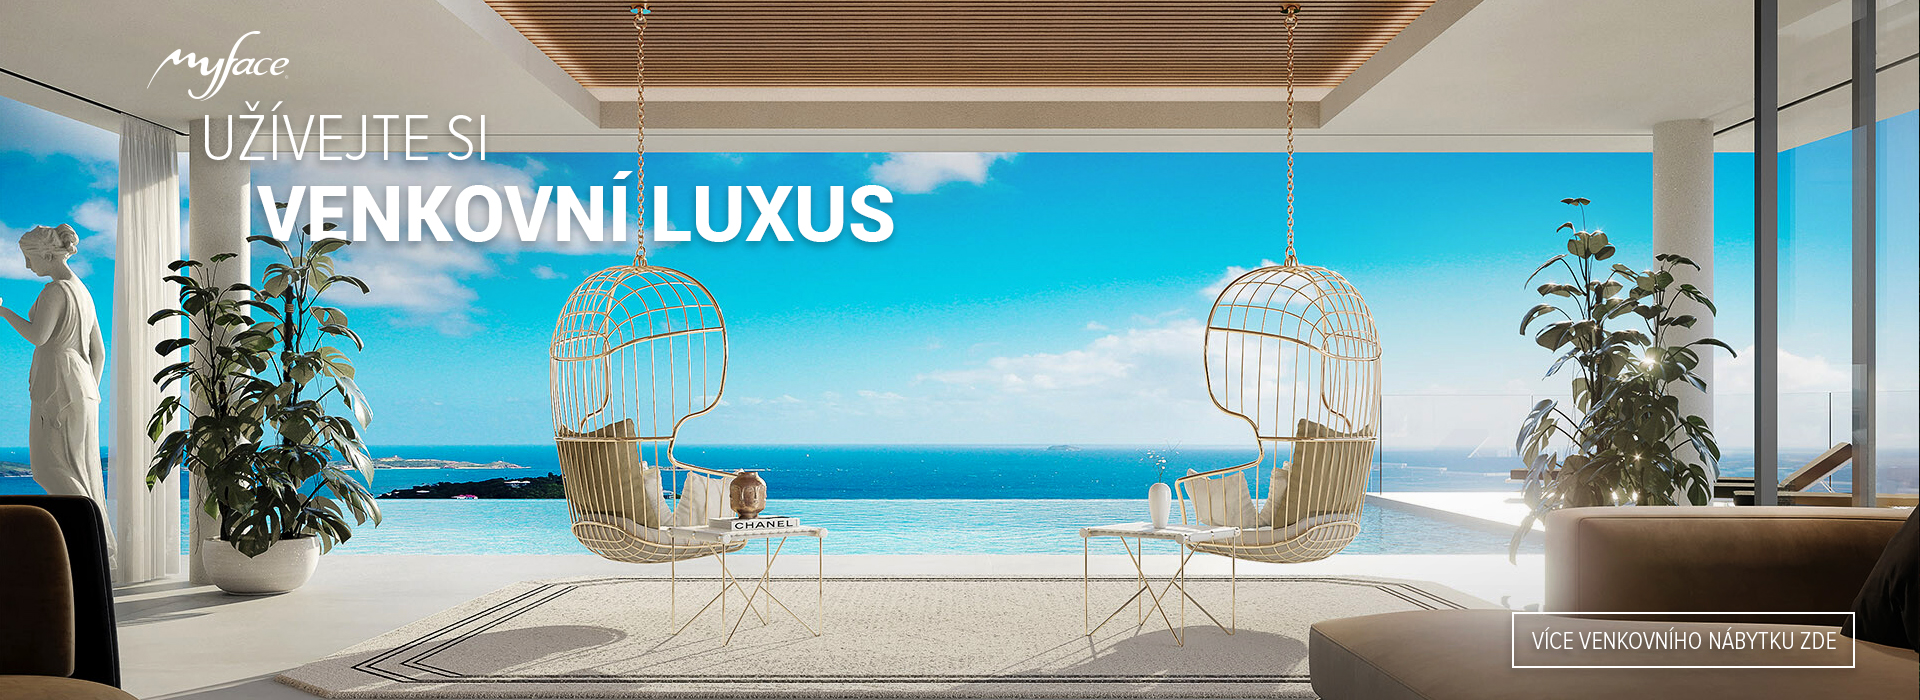 Spa Studio - Luxurious outdoor furniture Myface